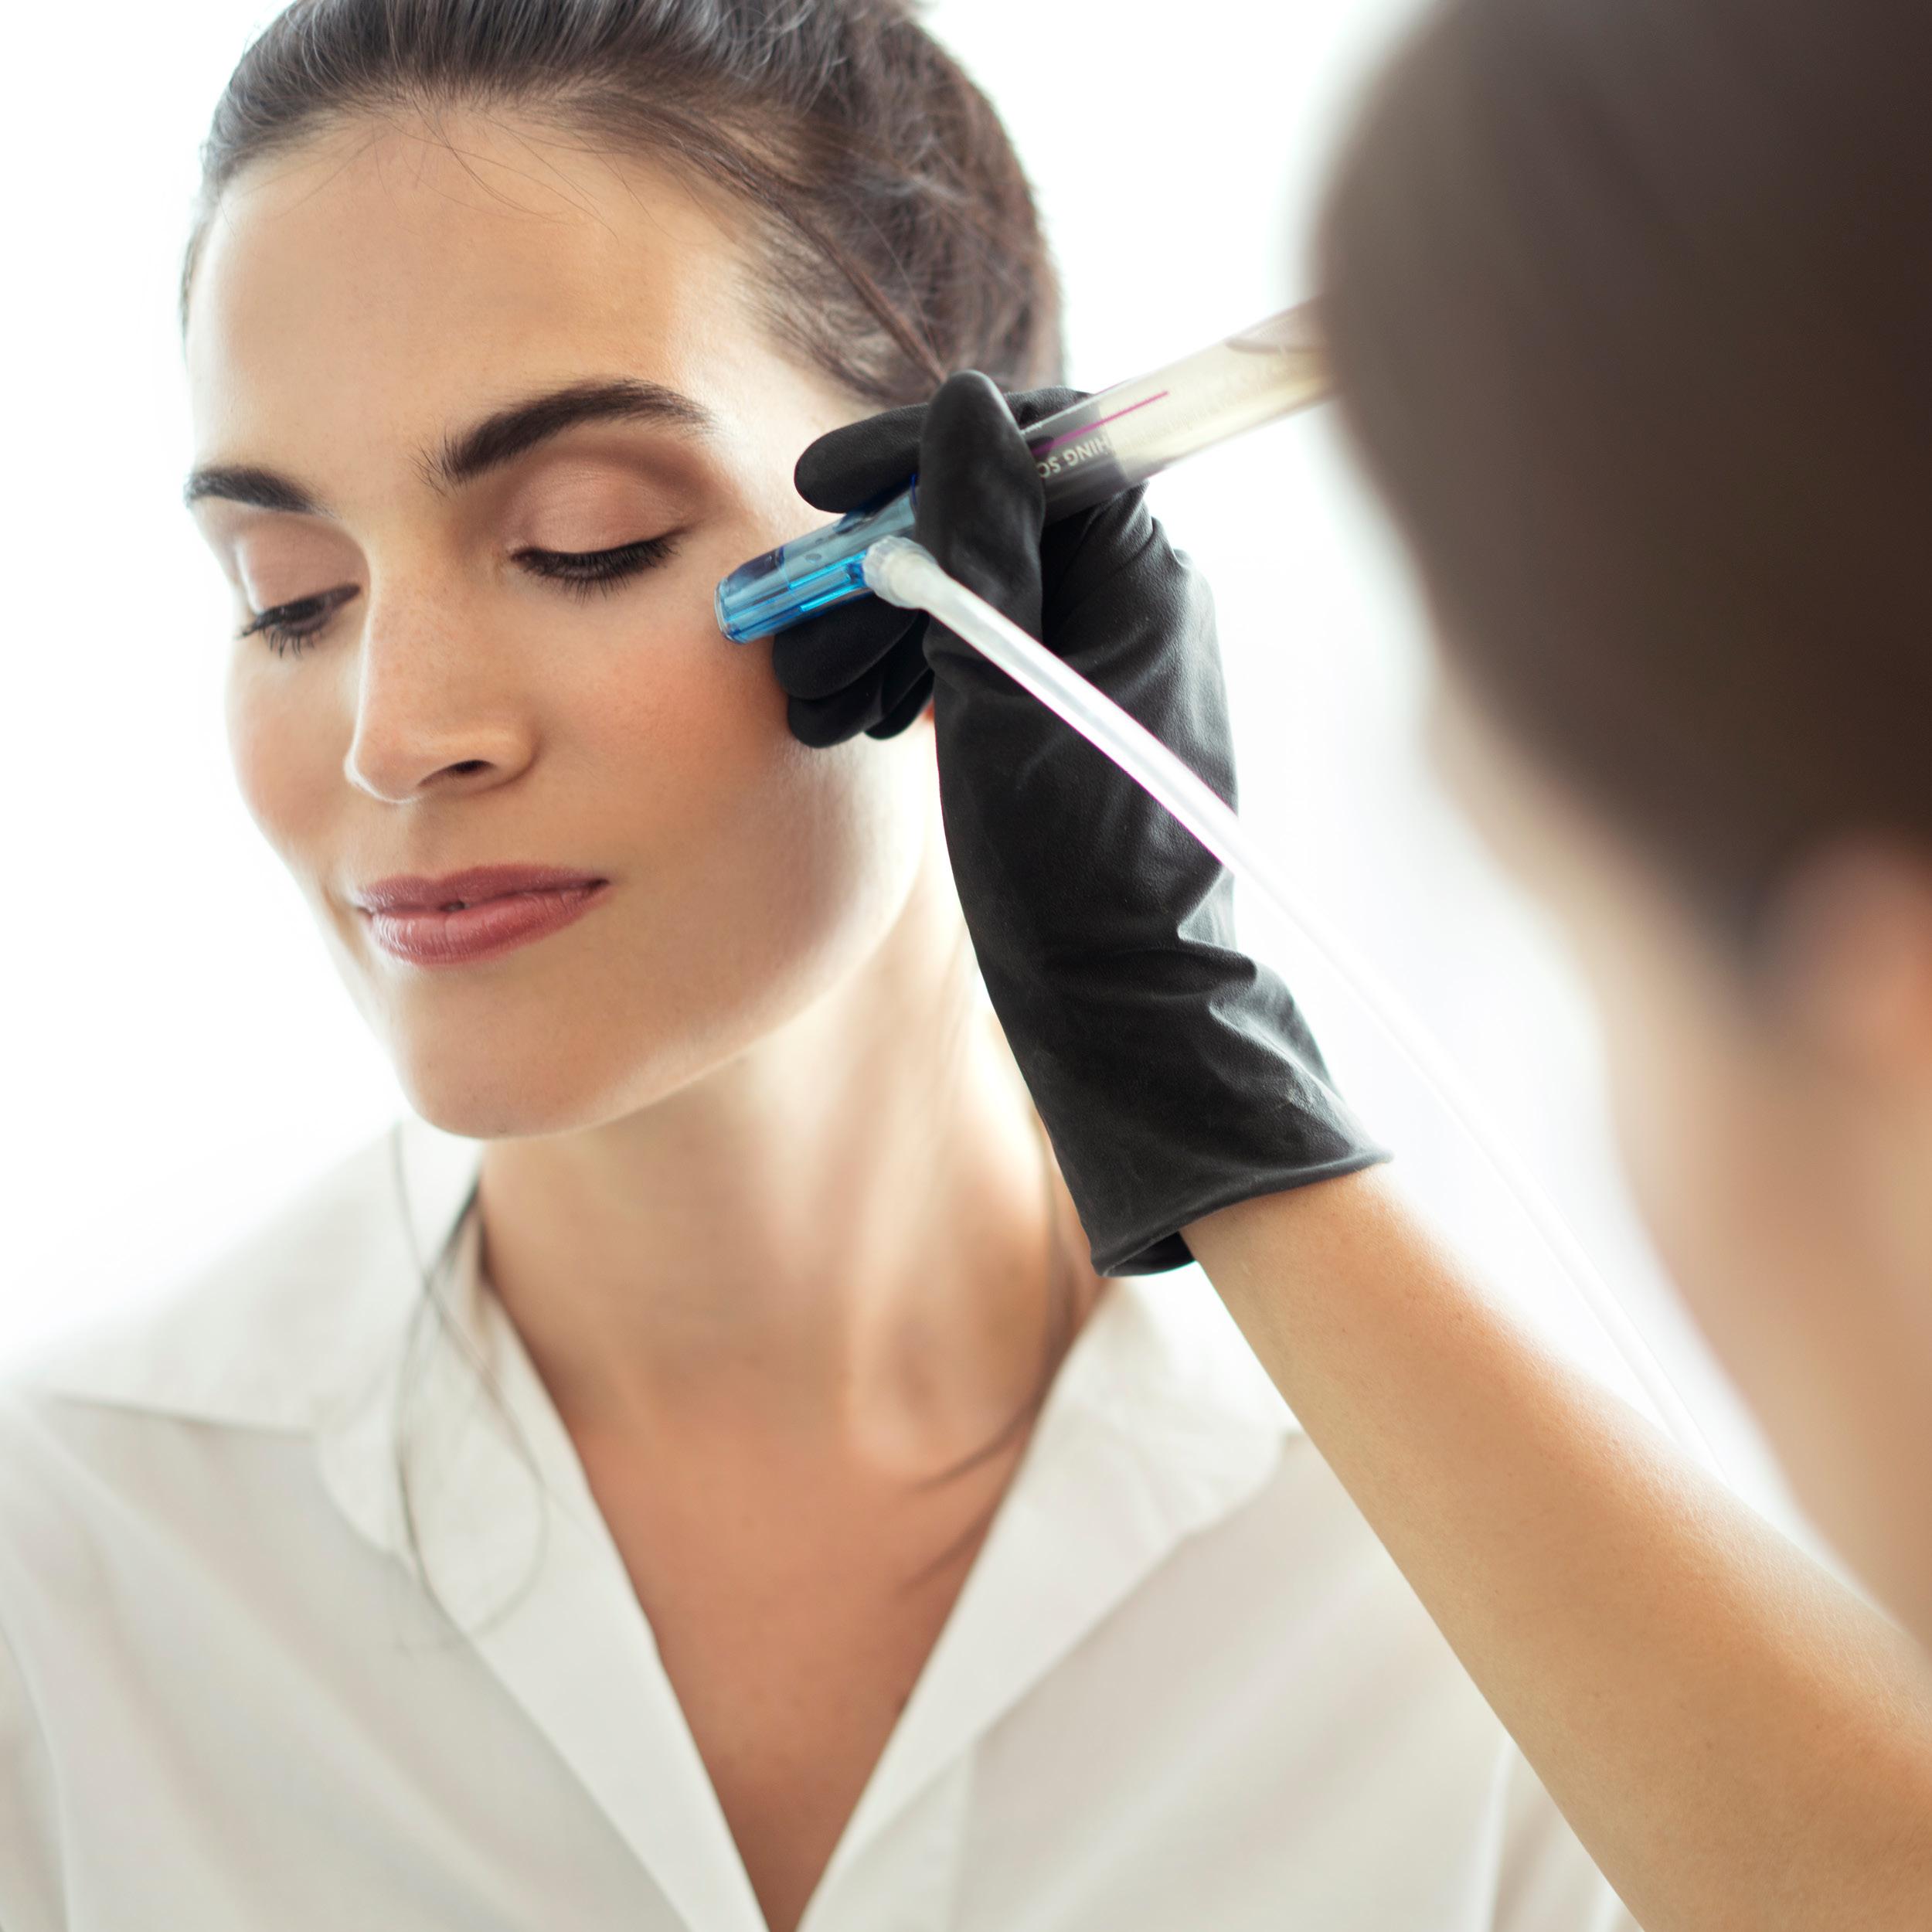 hydrafacial perk skin cosmetics london treatment eyes lips